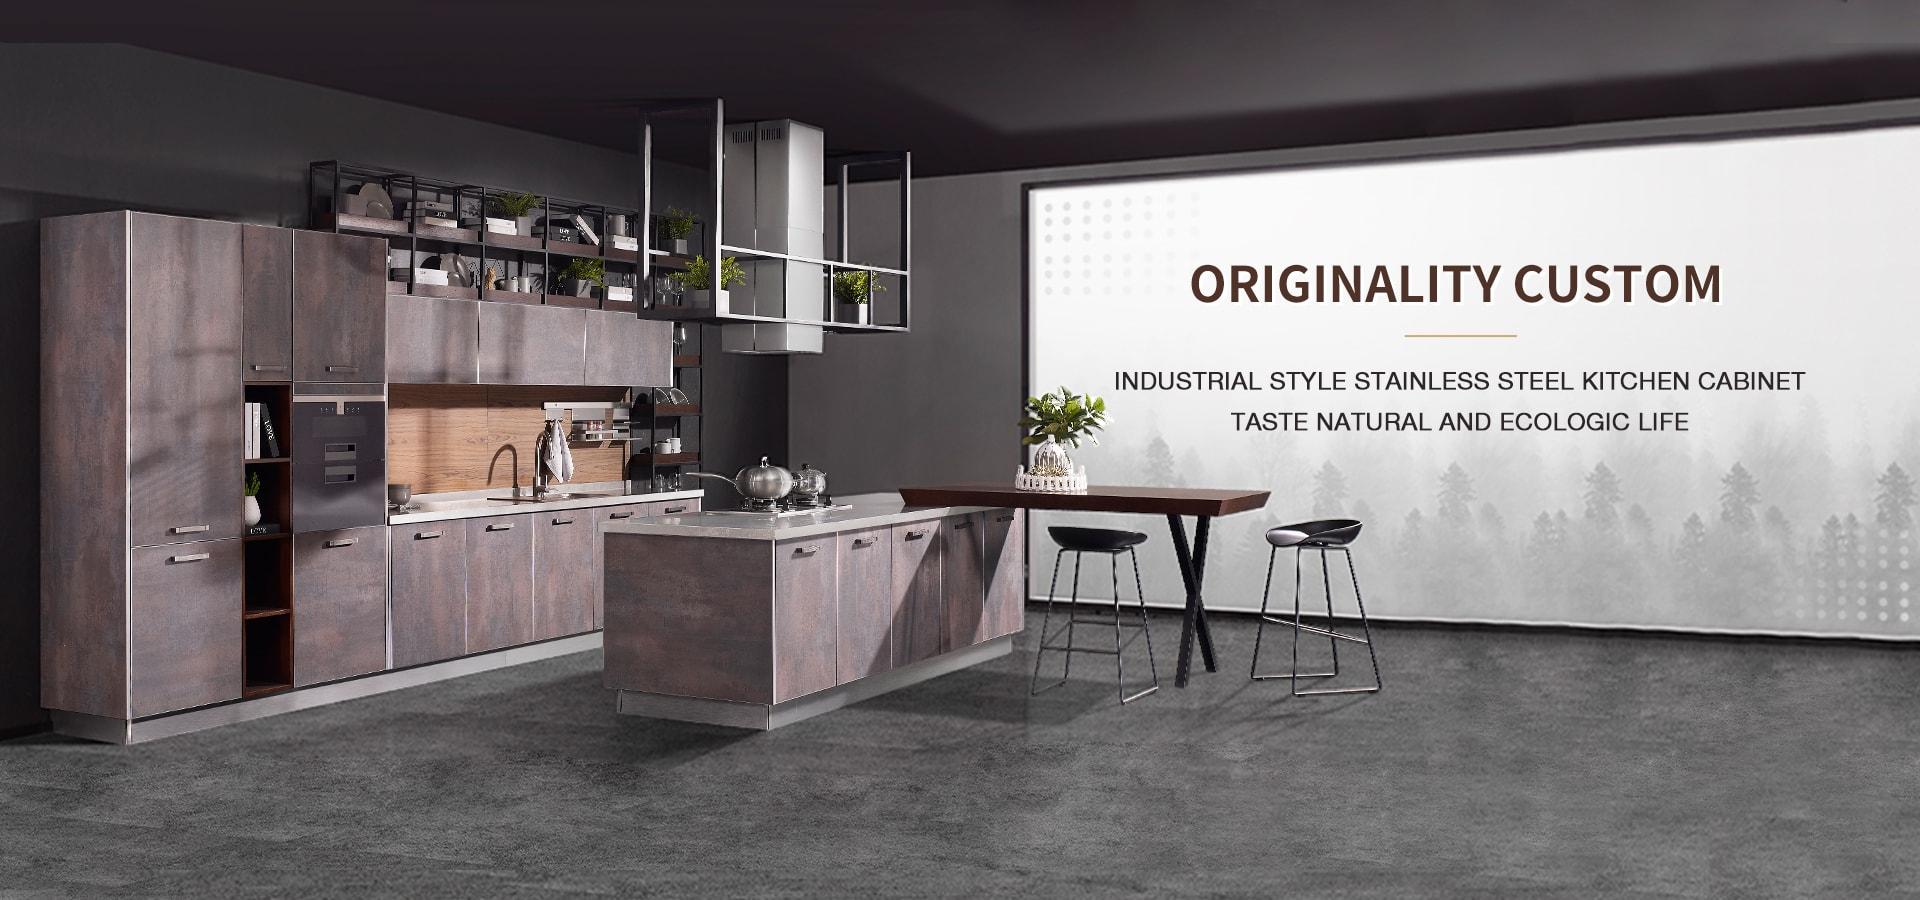 Stainless-Steel-Kitchen-Cabinets--Custom-Kitchen-Cupboards-1